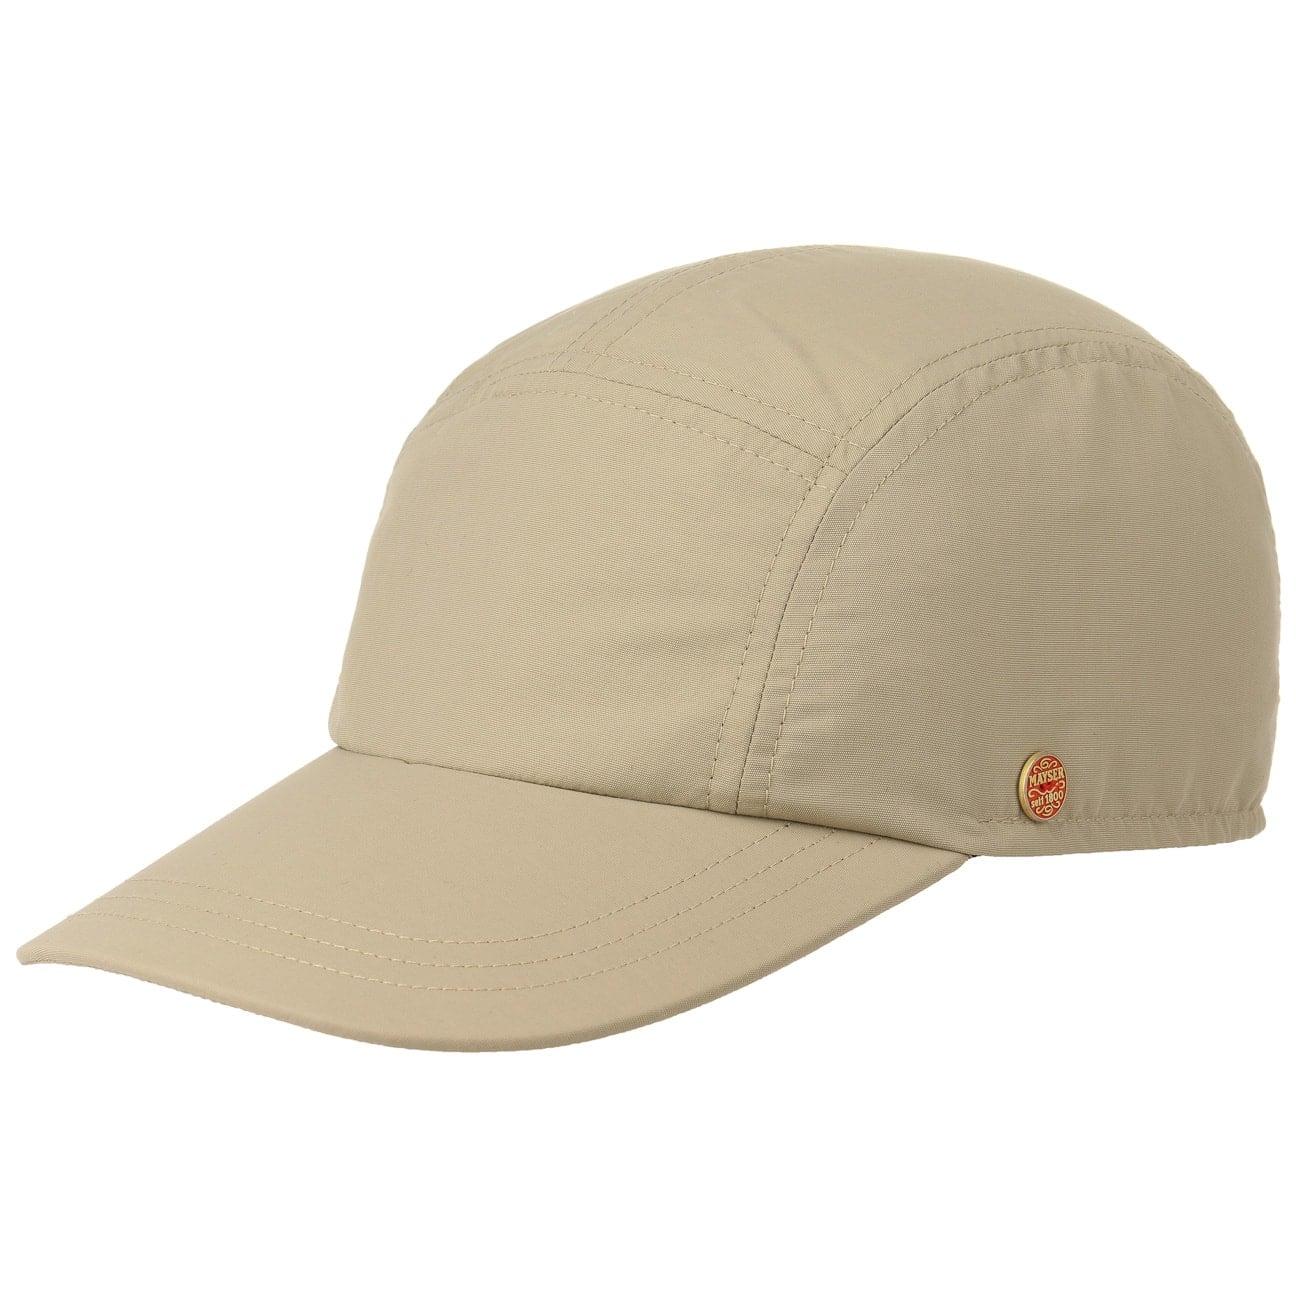 Gorra Riccardo Sunblocker by Mayser  fitted cap